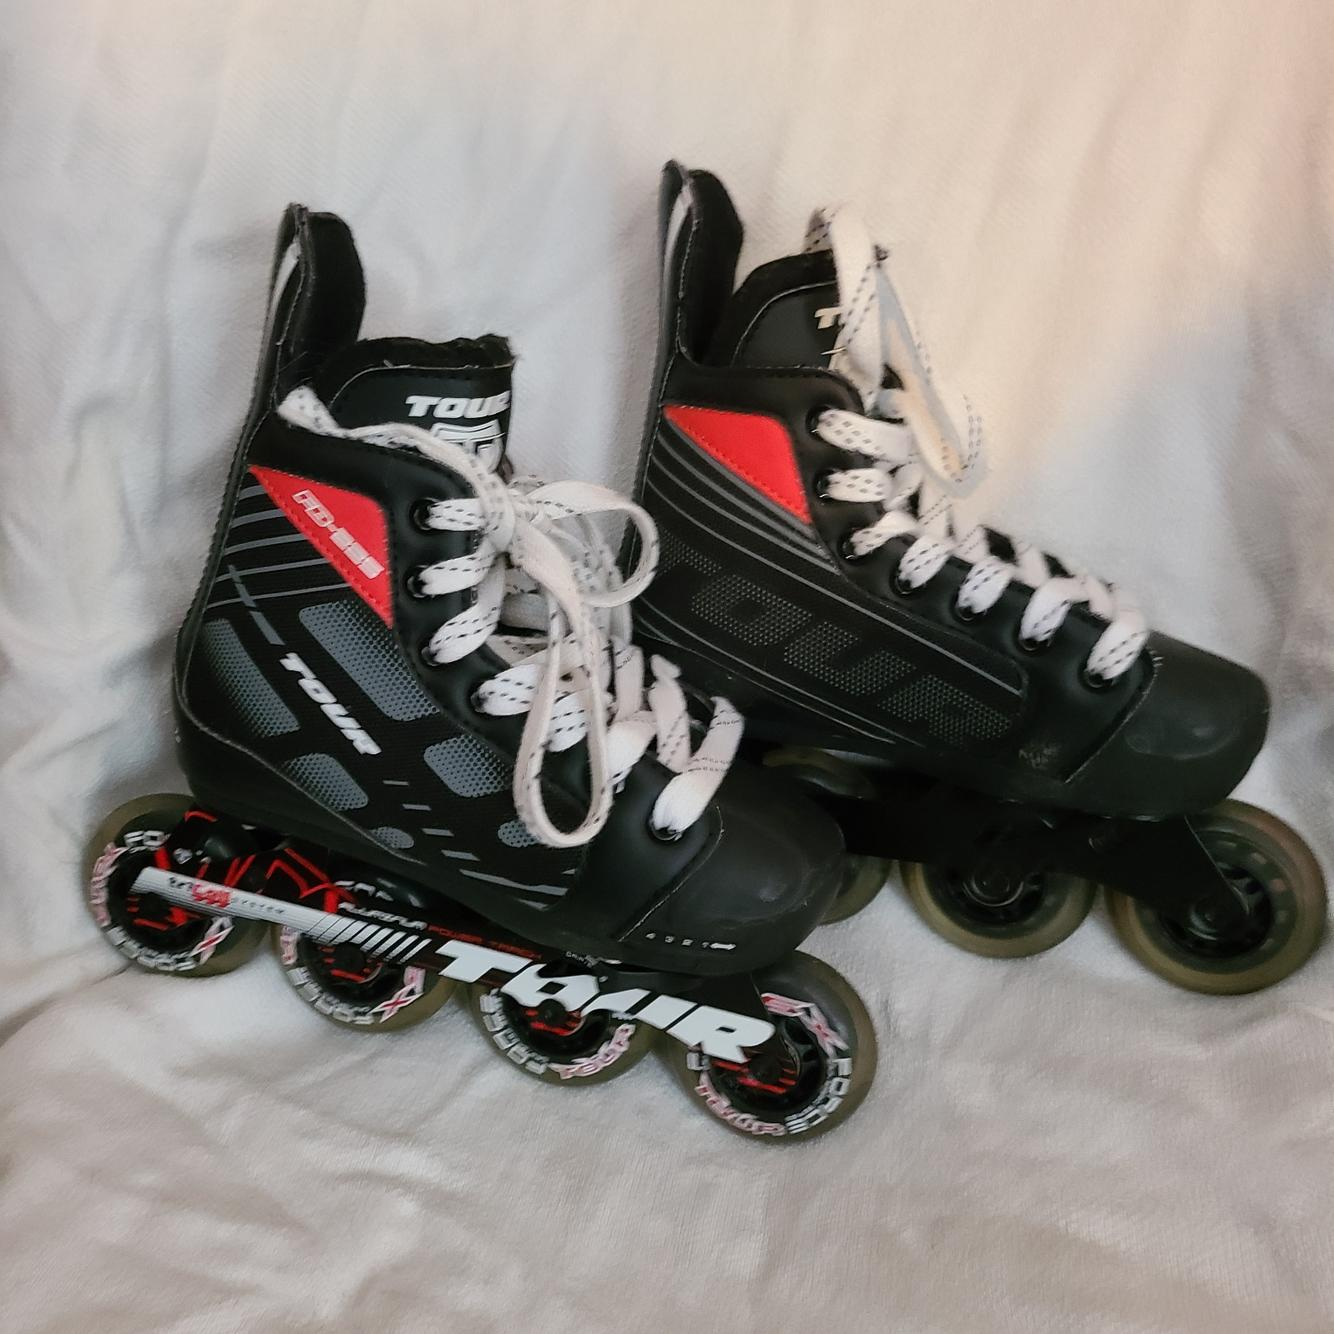 Tour Nano Code Technology Fb 225 Inline Hockey Rollerblade Youth Size 1 4 Inline Roller Street Hockey Skates